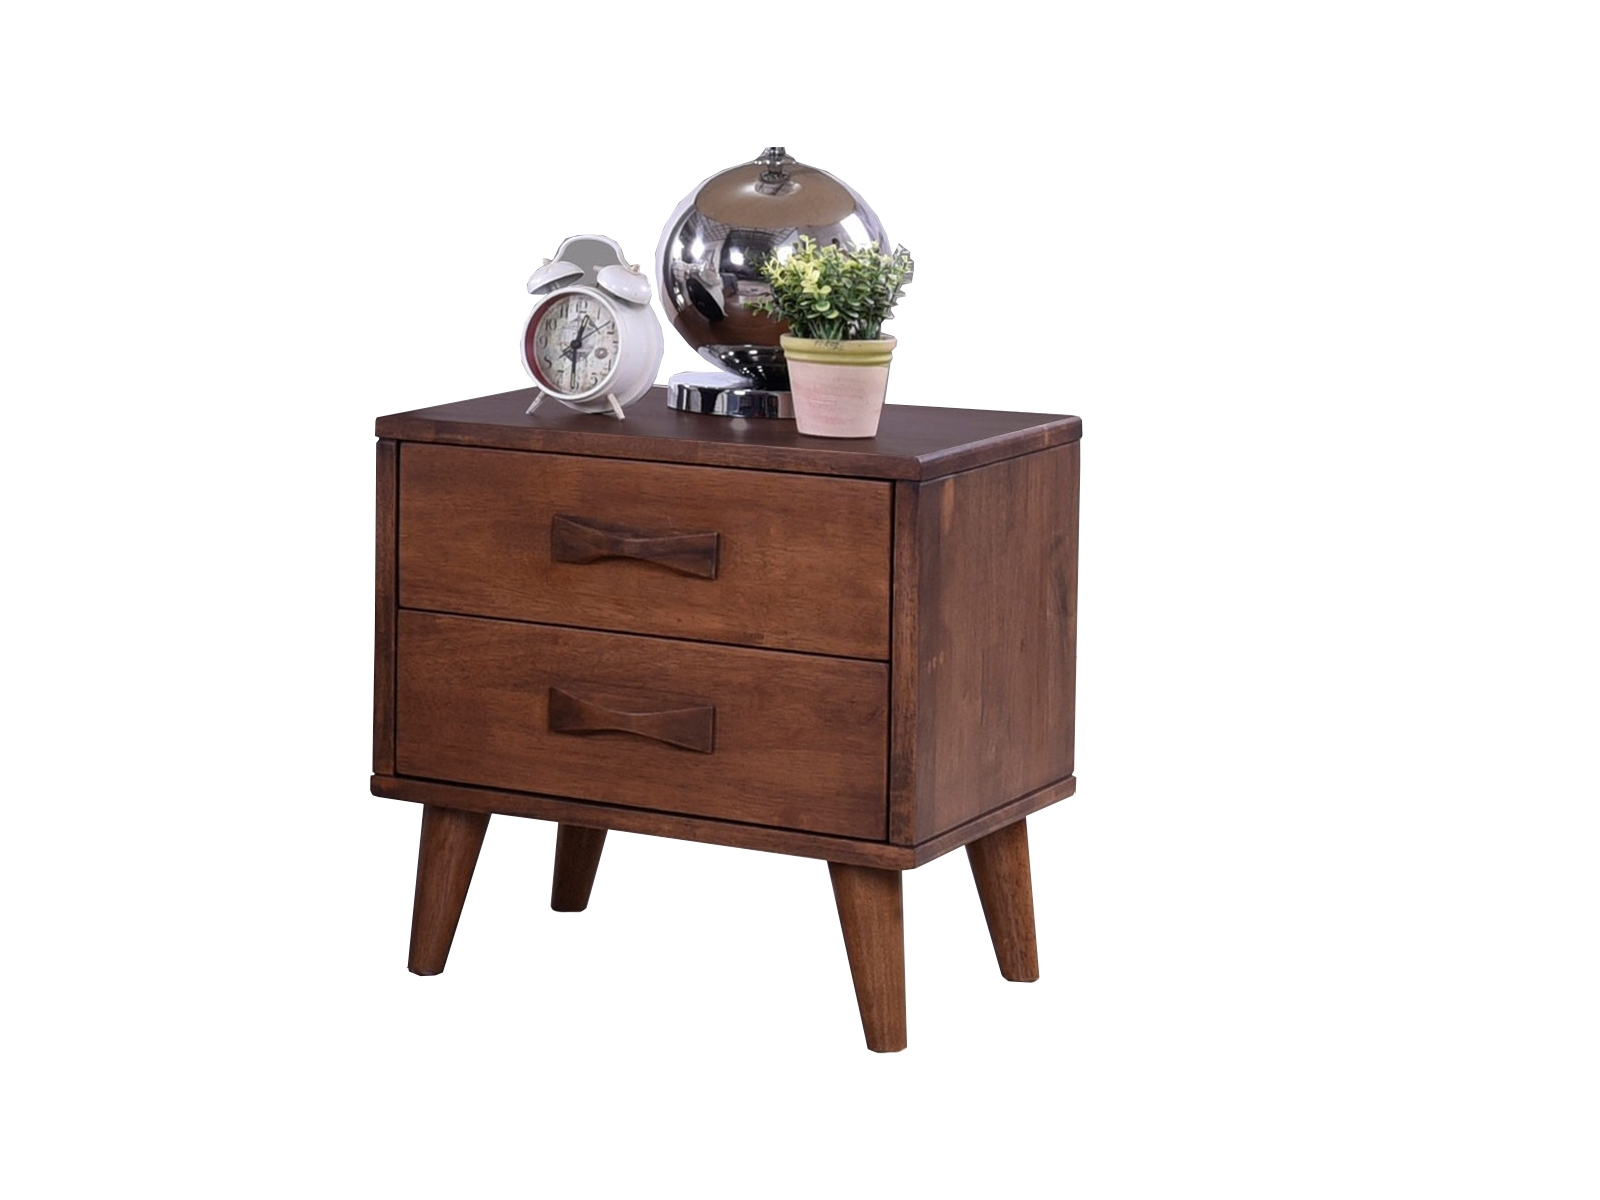 Noptiera din lemn cu 2 sertare Emily Walnut, l47xA40xH50 cm somproduct.ro